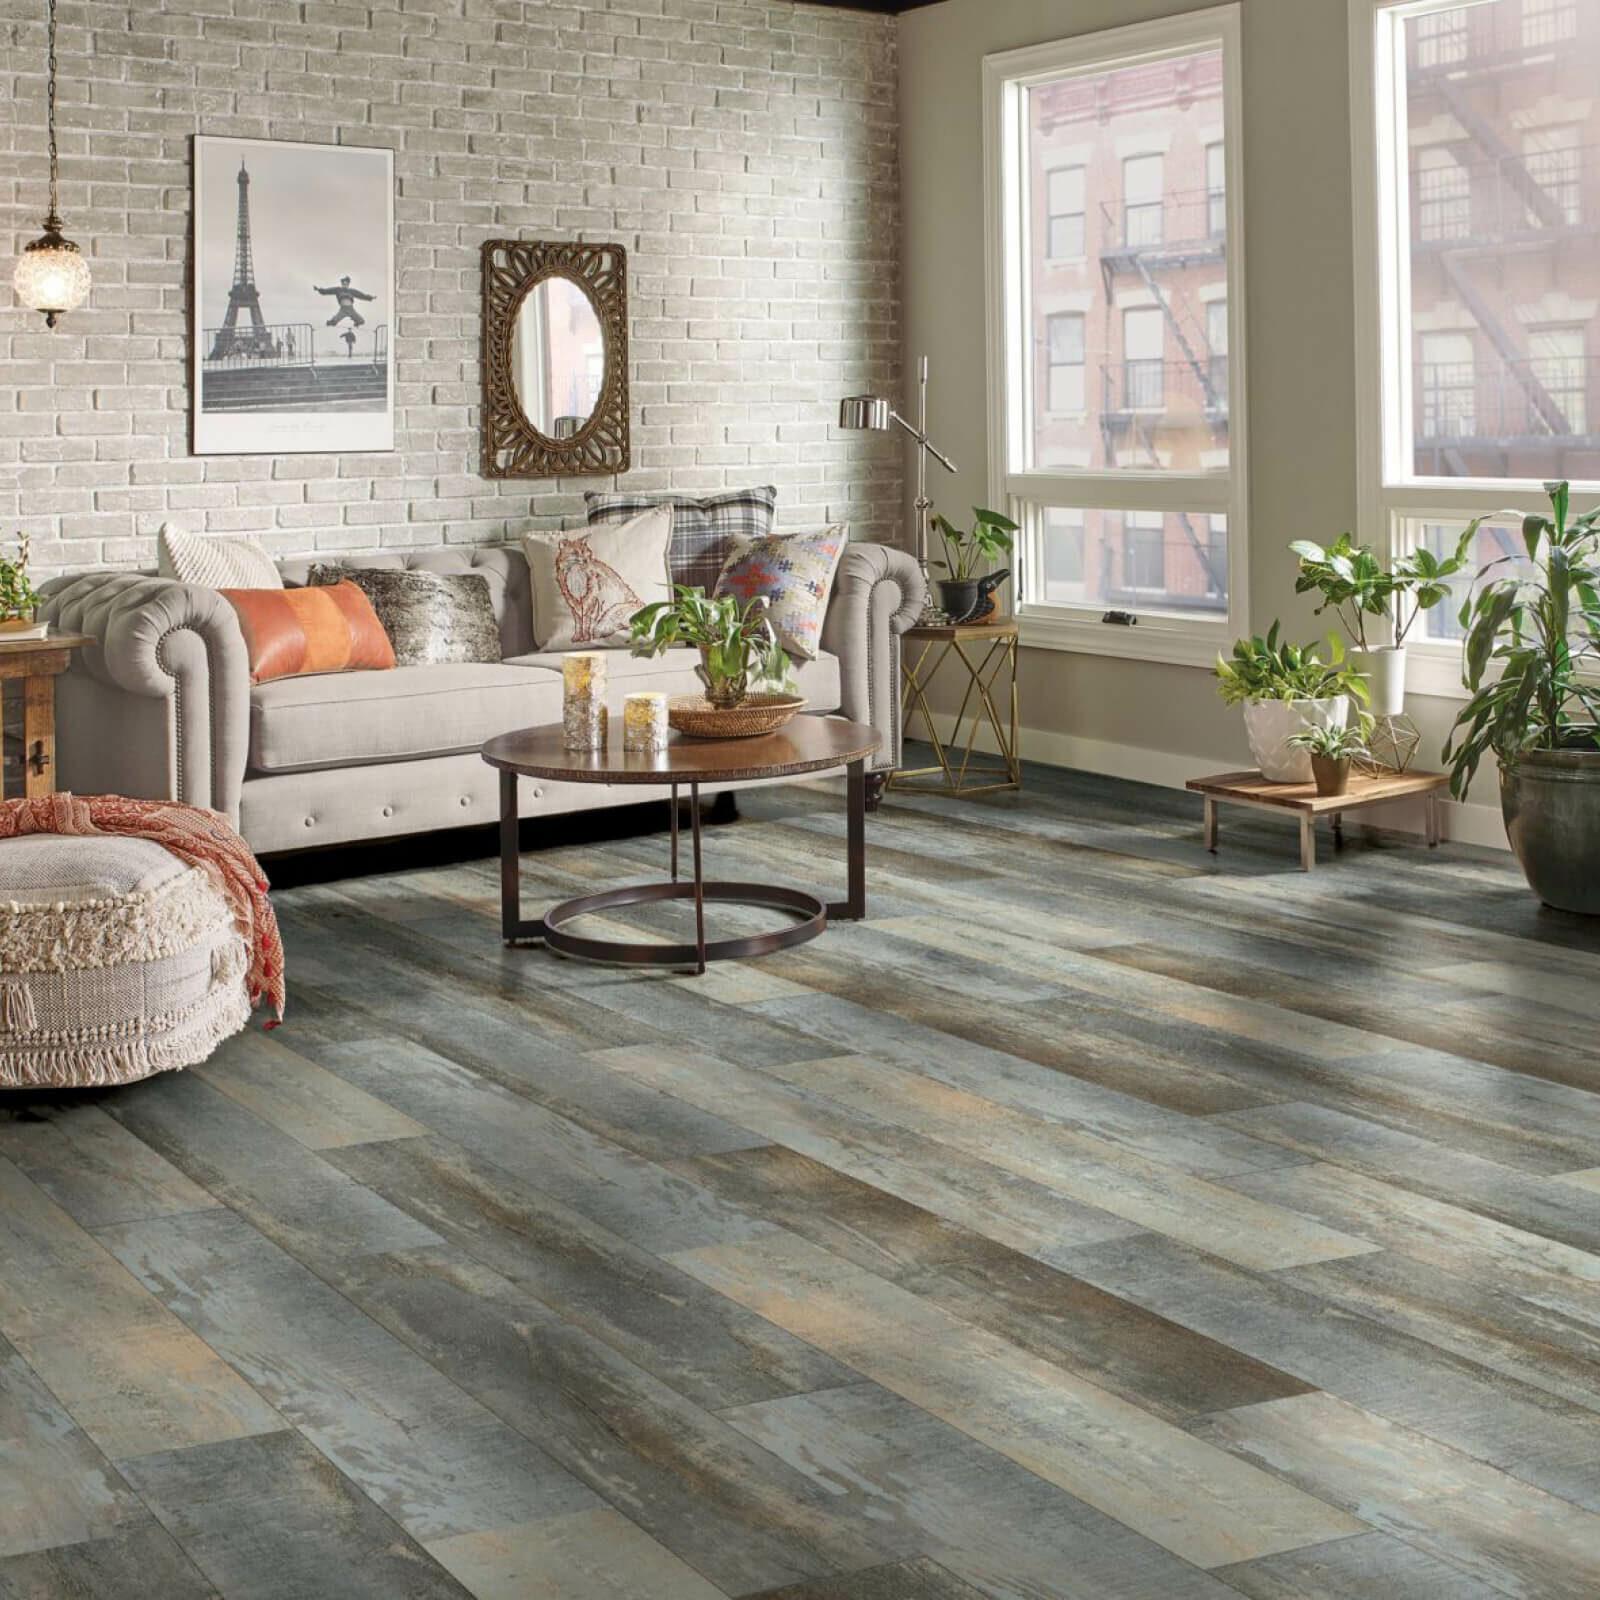 Interior with vinyl flooring | Flooring 101